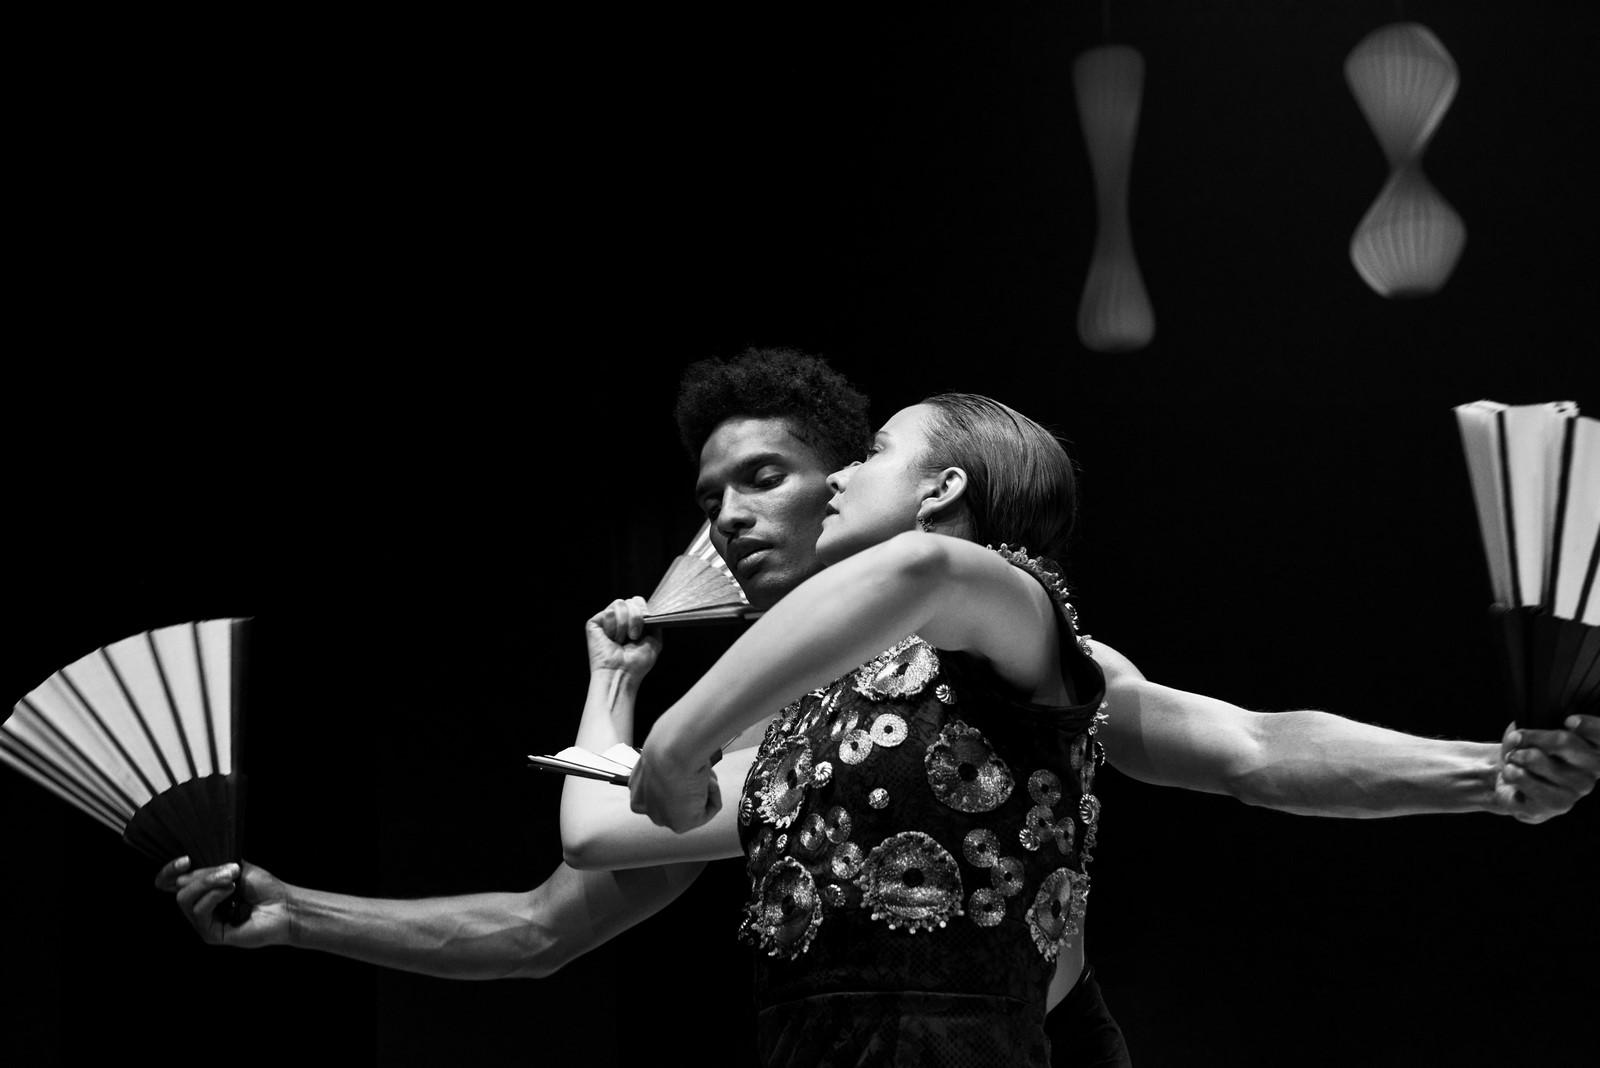 Anmeldelse: Sommerballet: Monochrome, Bellevue Teatret